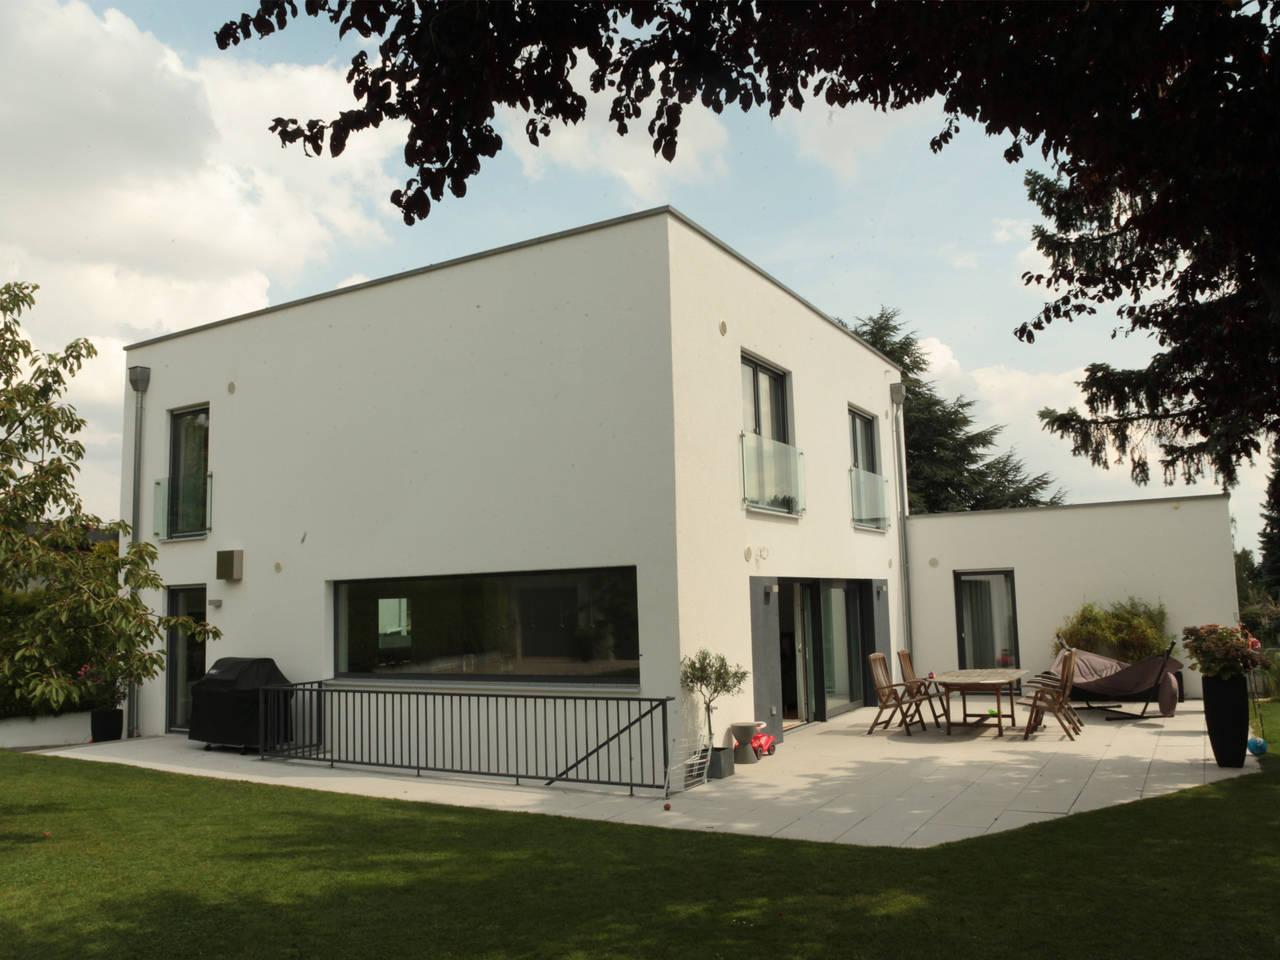 Konzepthaus Referenzhaus 2